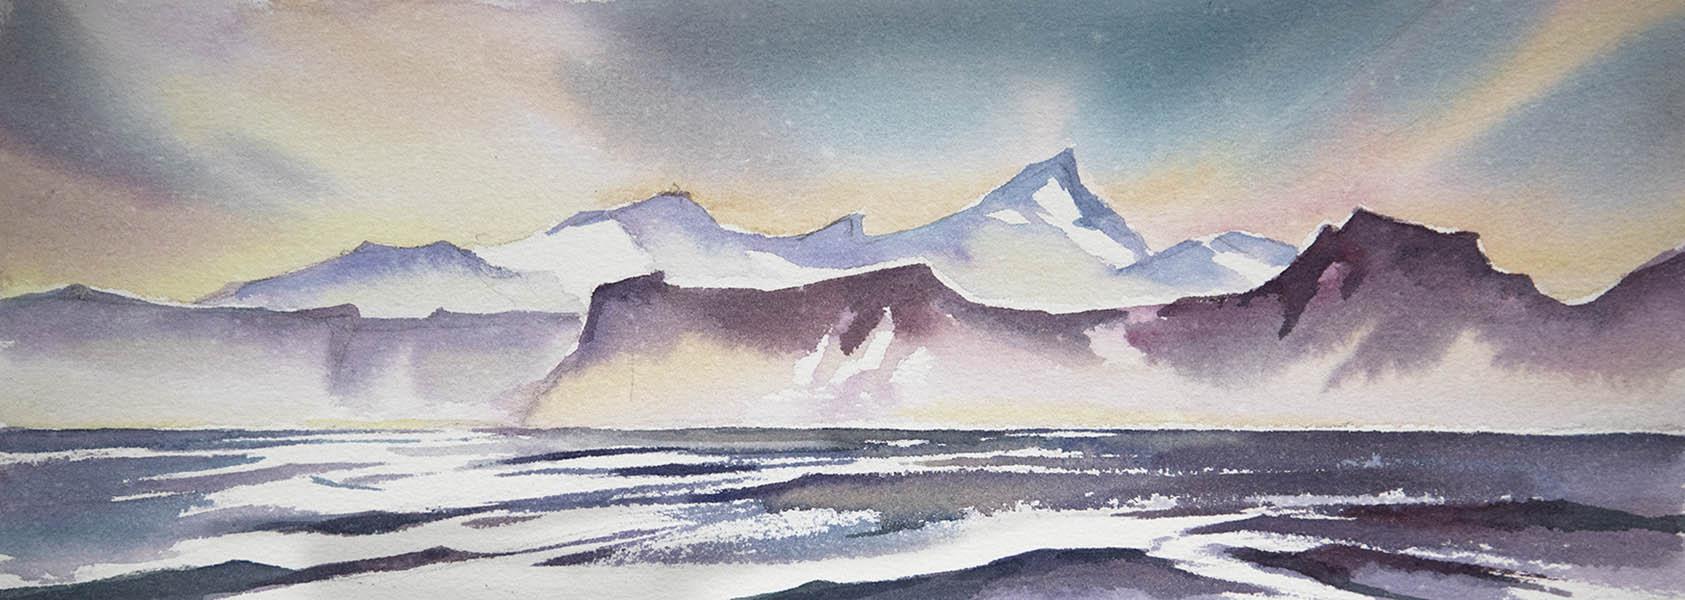 Crossing The Arctic Circle n.2